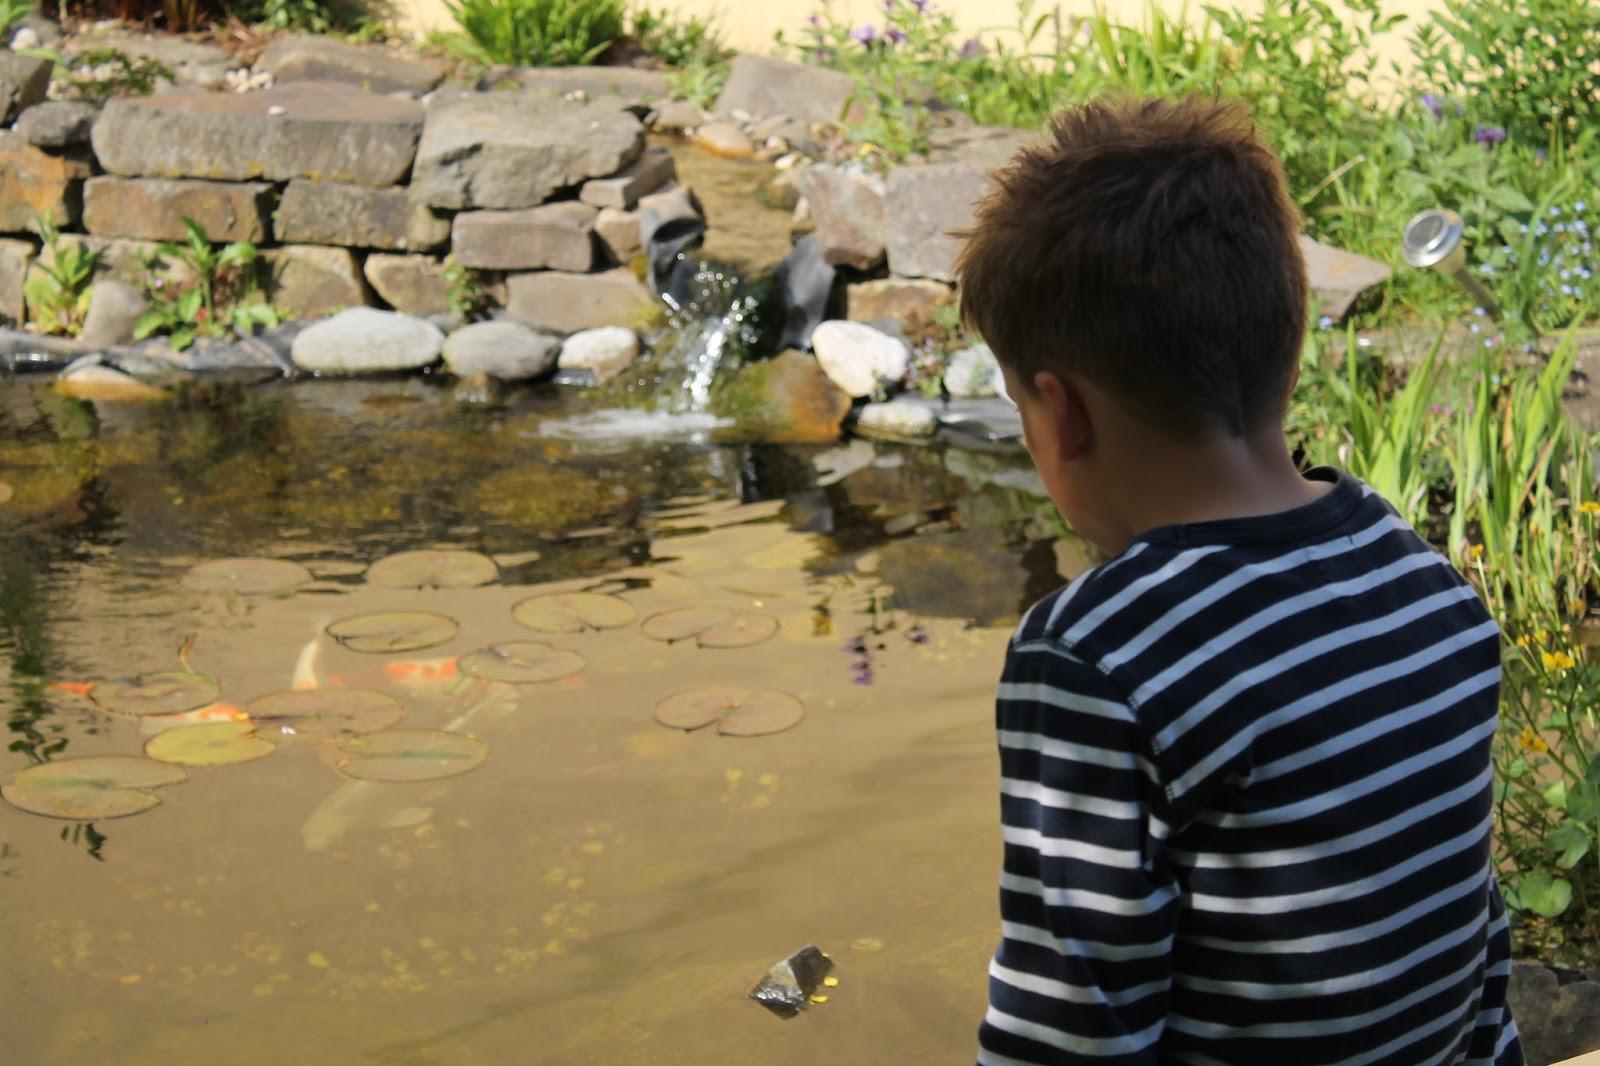 Lieblingsneffe am Teich Koy Karpfen